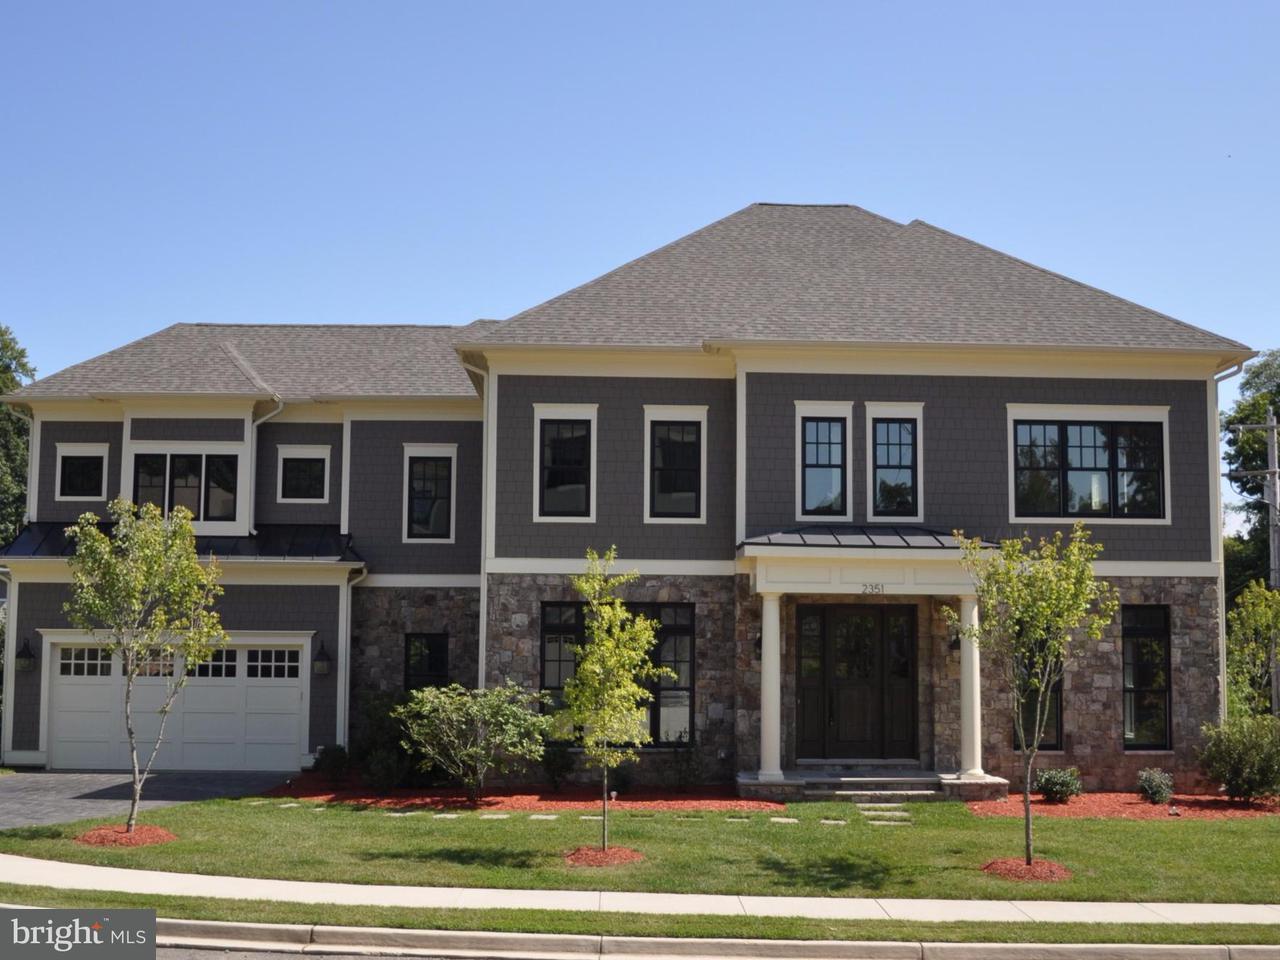 Single Family Home for Sale at 2351 DANIEL Street 2351 DANIEL Street Arlington, Virginia 22207 United States